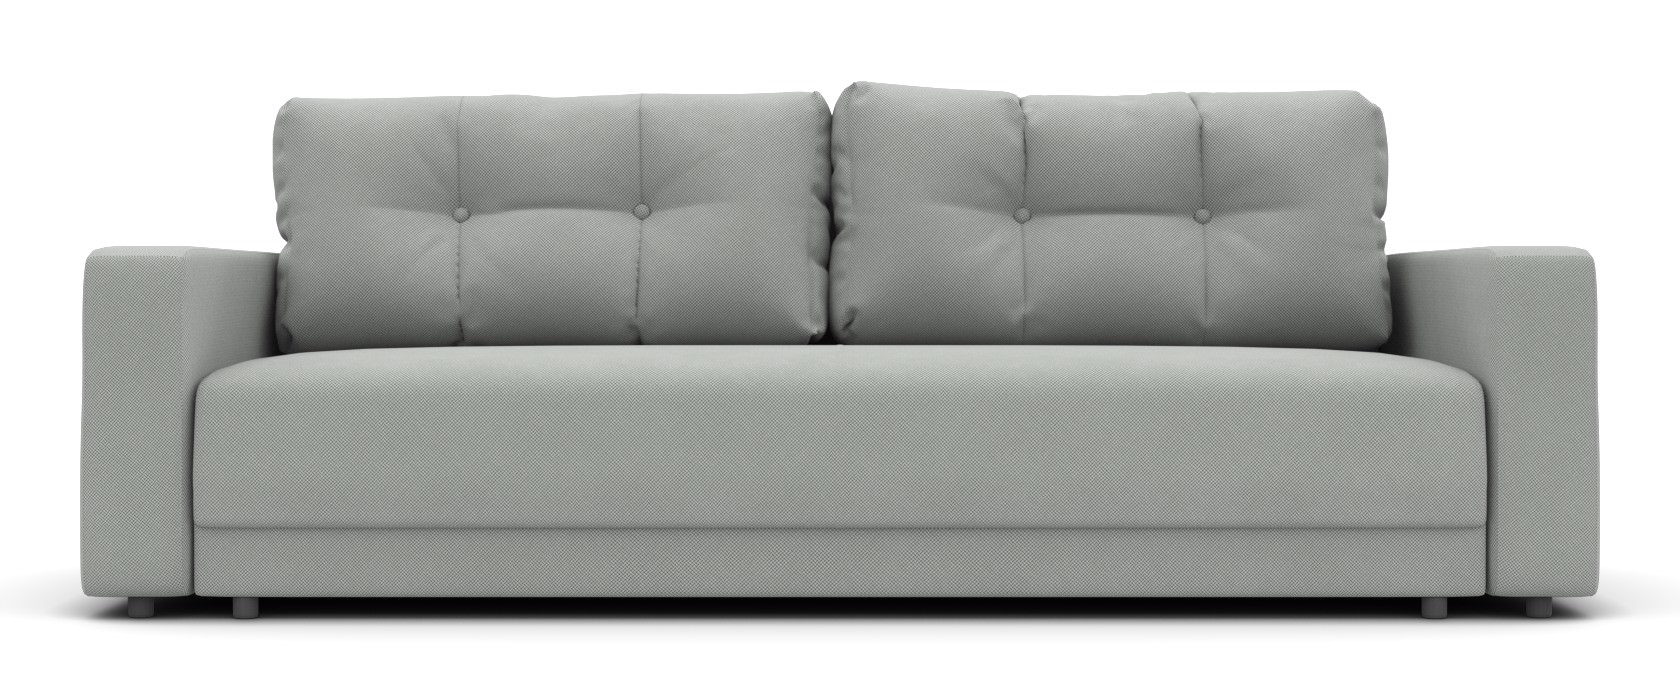 Тримісний диван Famiglia - Фото 1 - Pufetto